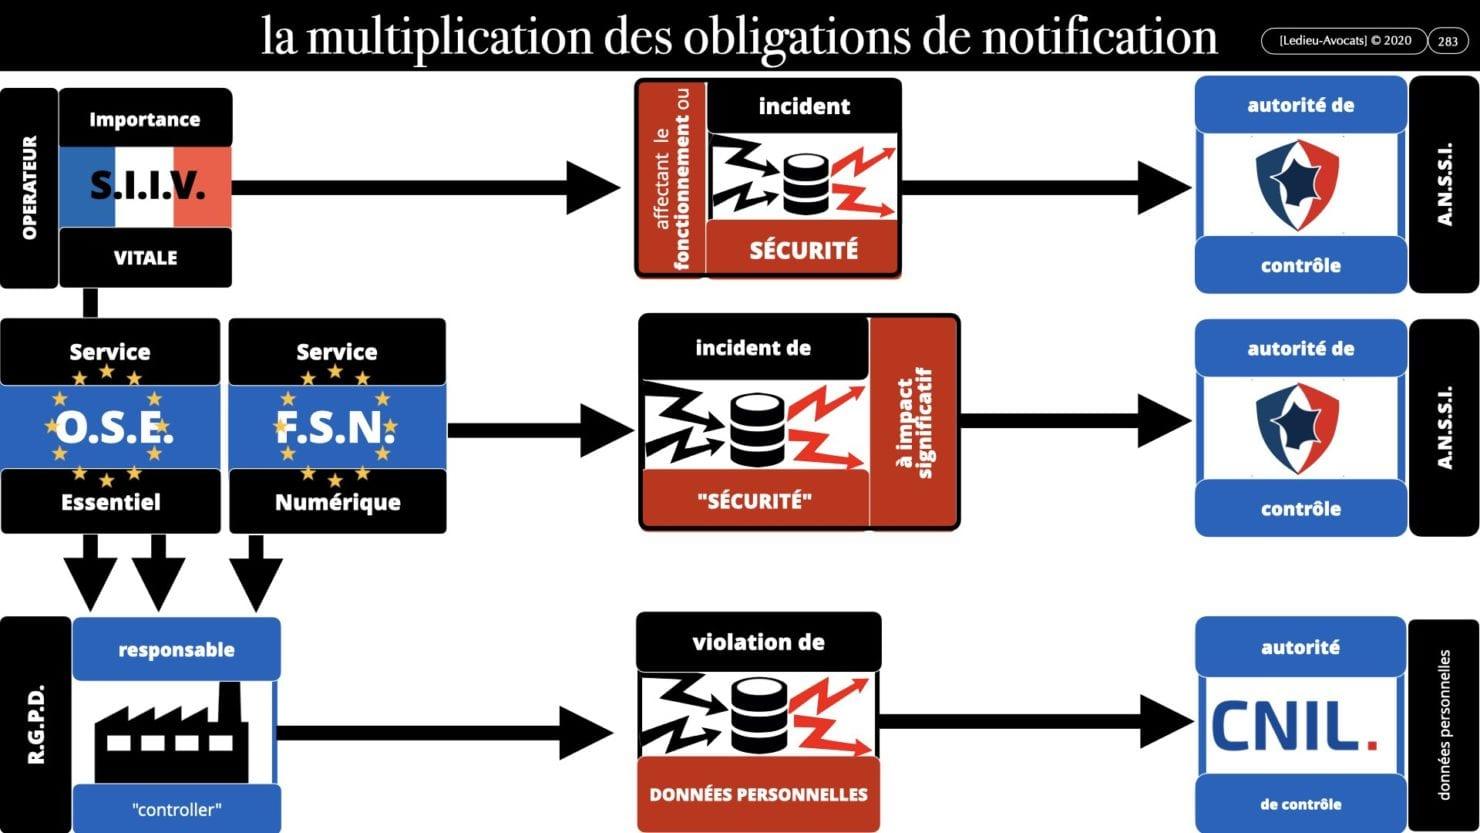 RGPD e-Privacy principes actualité jurisprudence ©Ledieu-Avocats 25-06-2021.283